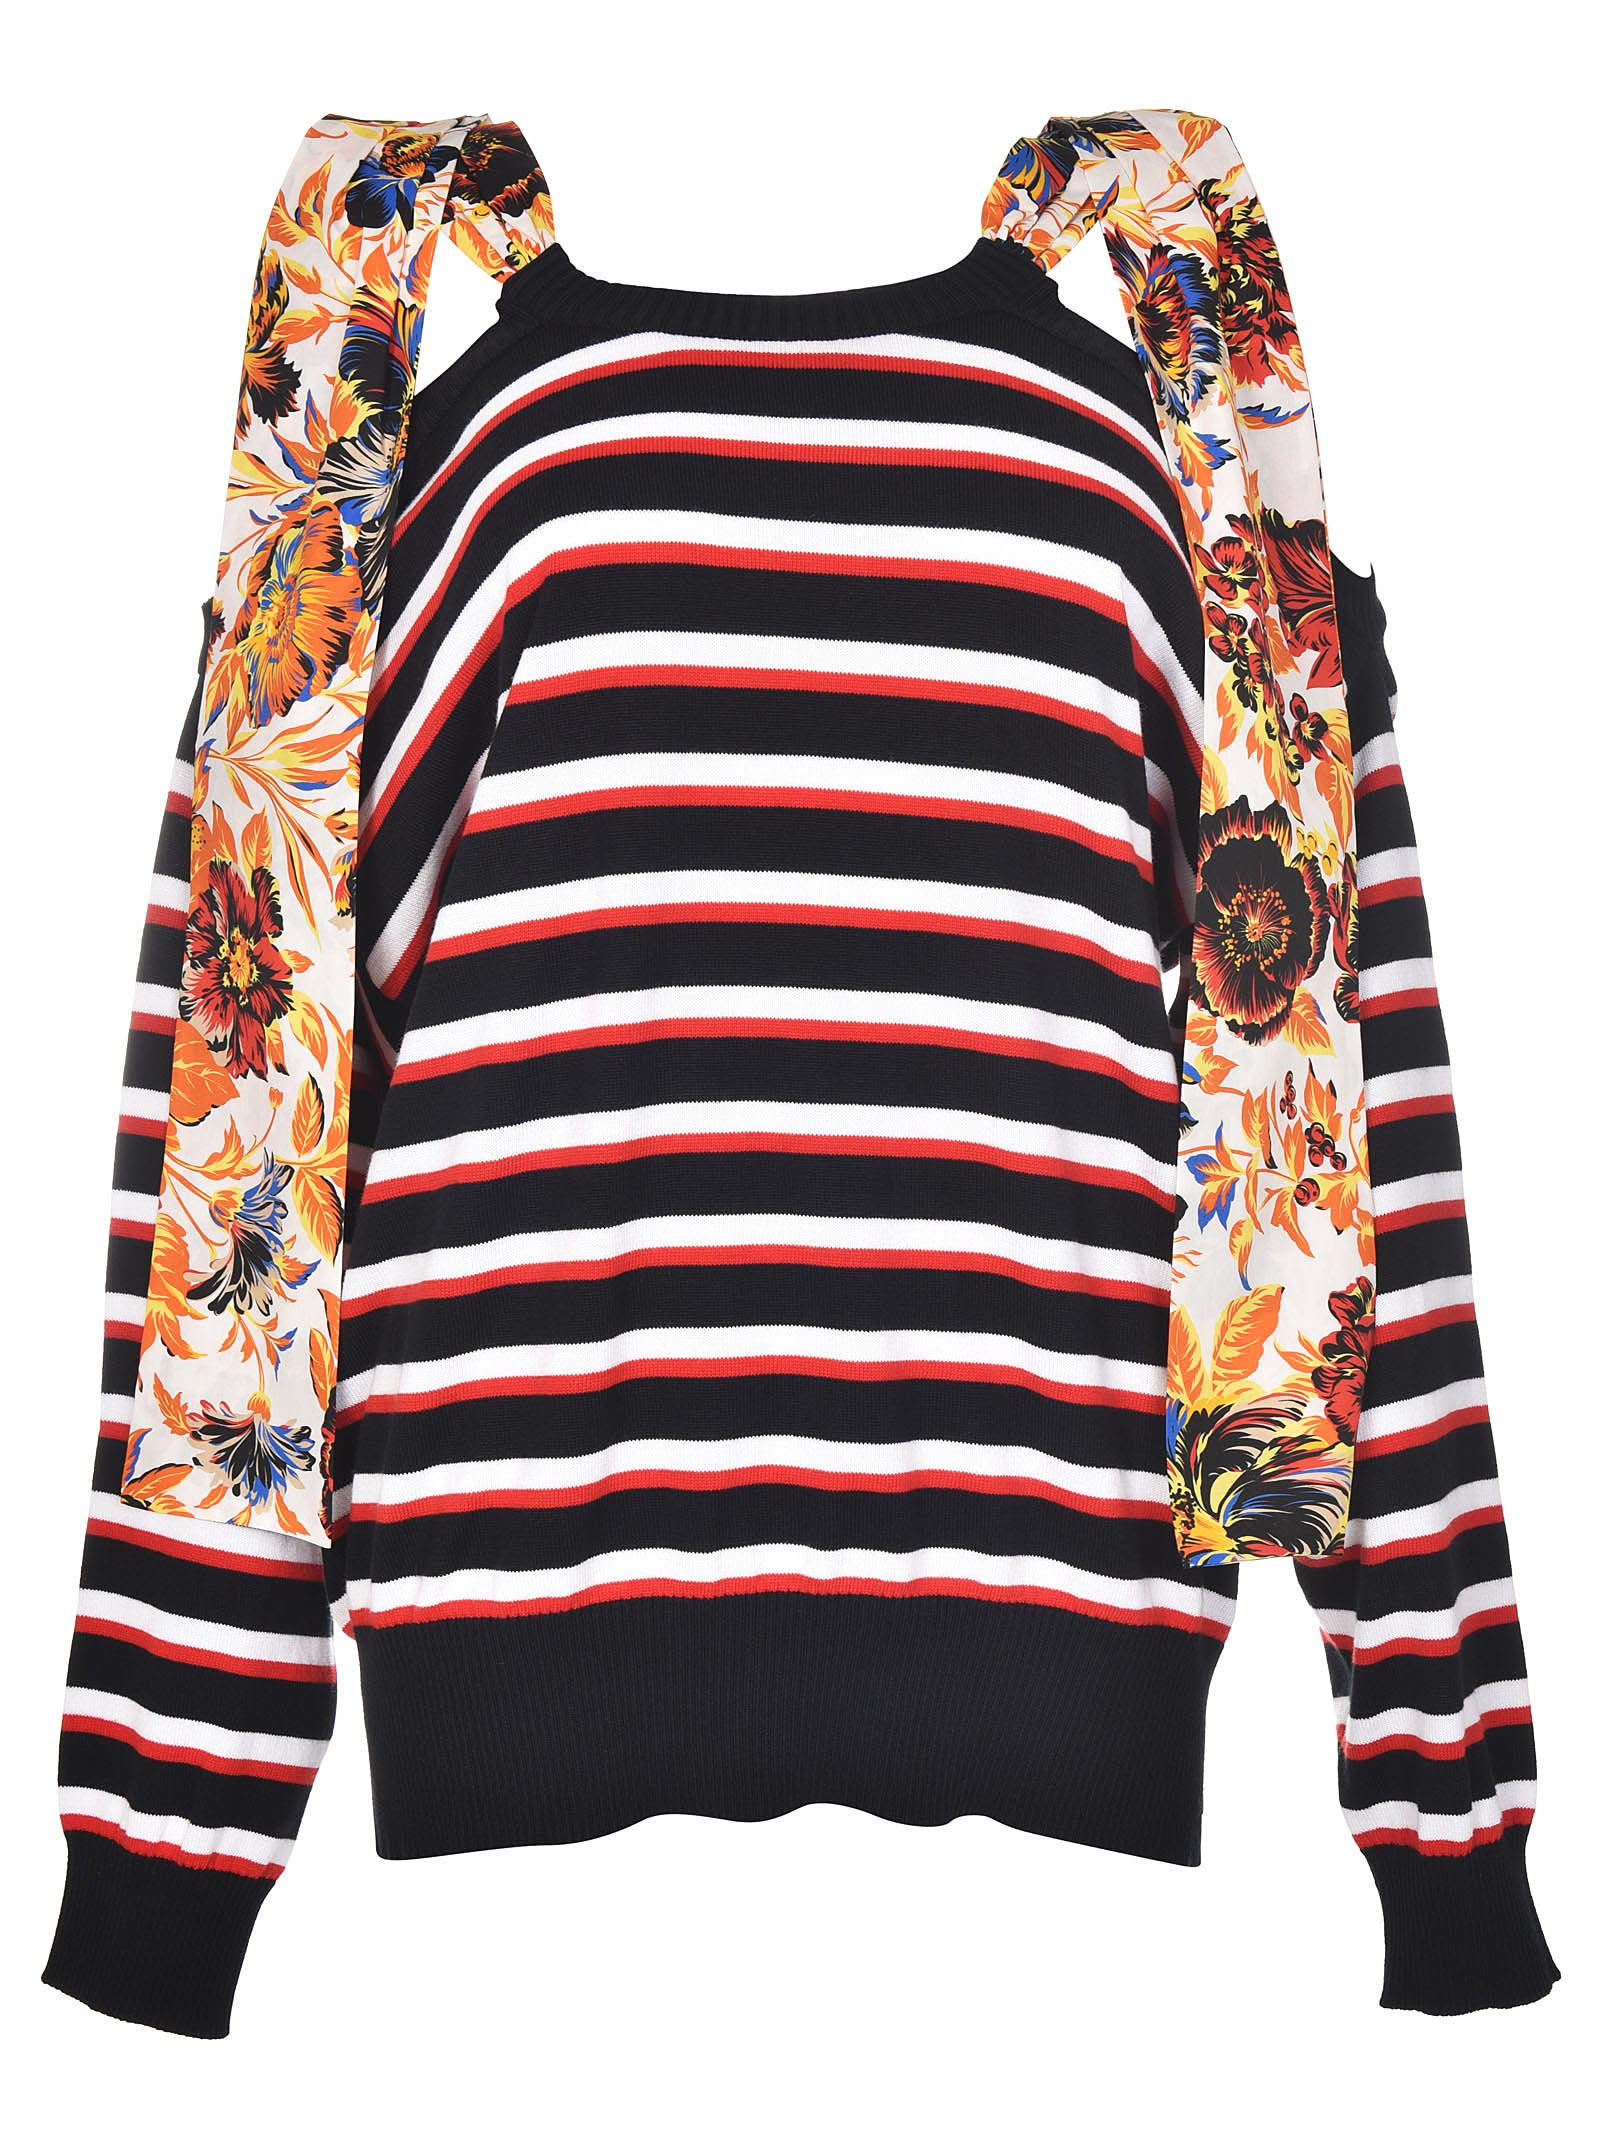 Msgm Floral Striped Jumper